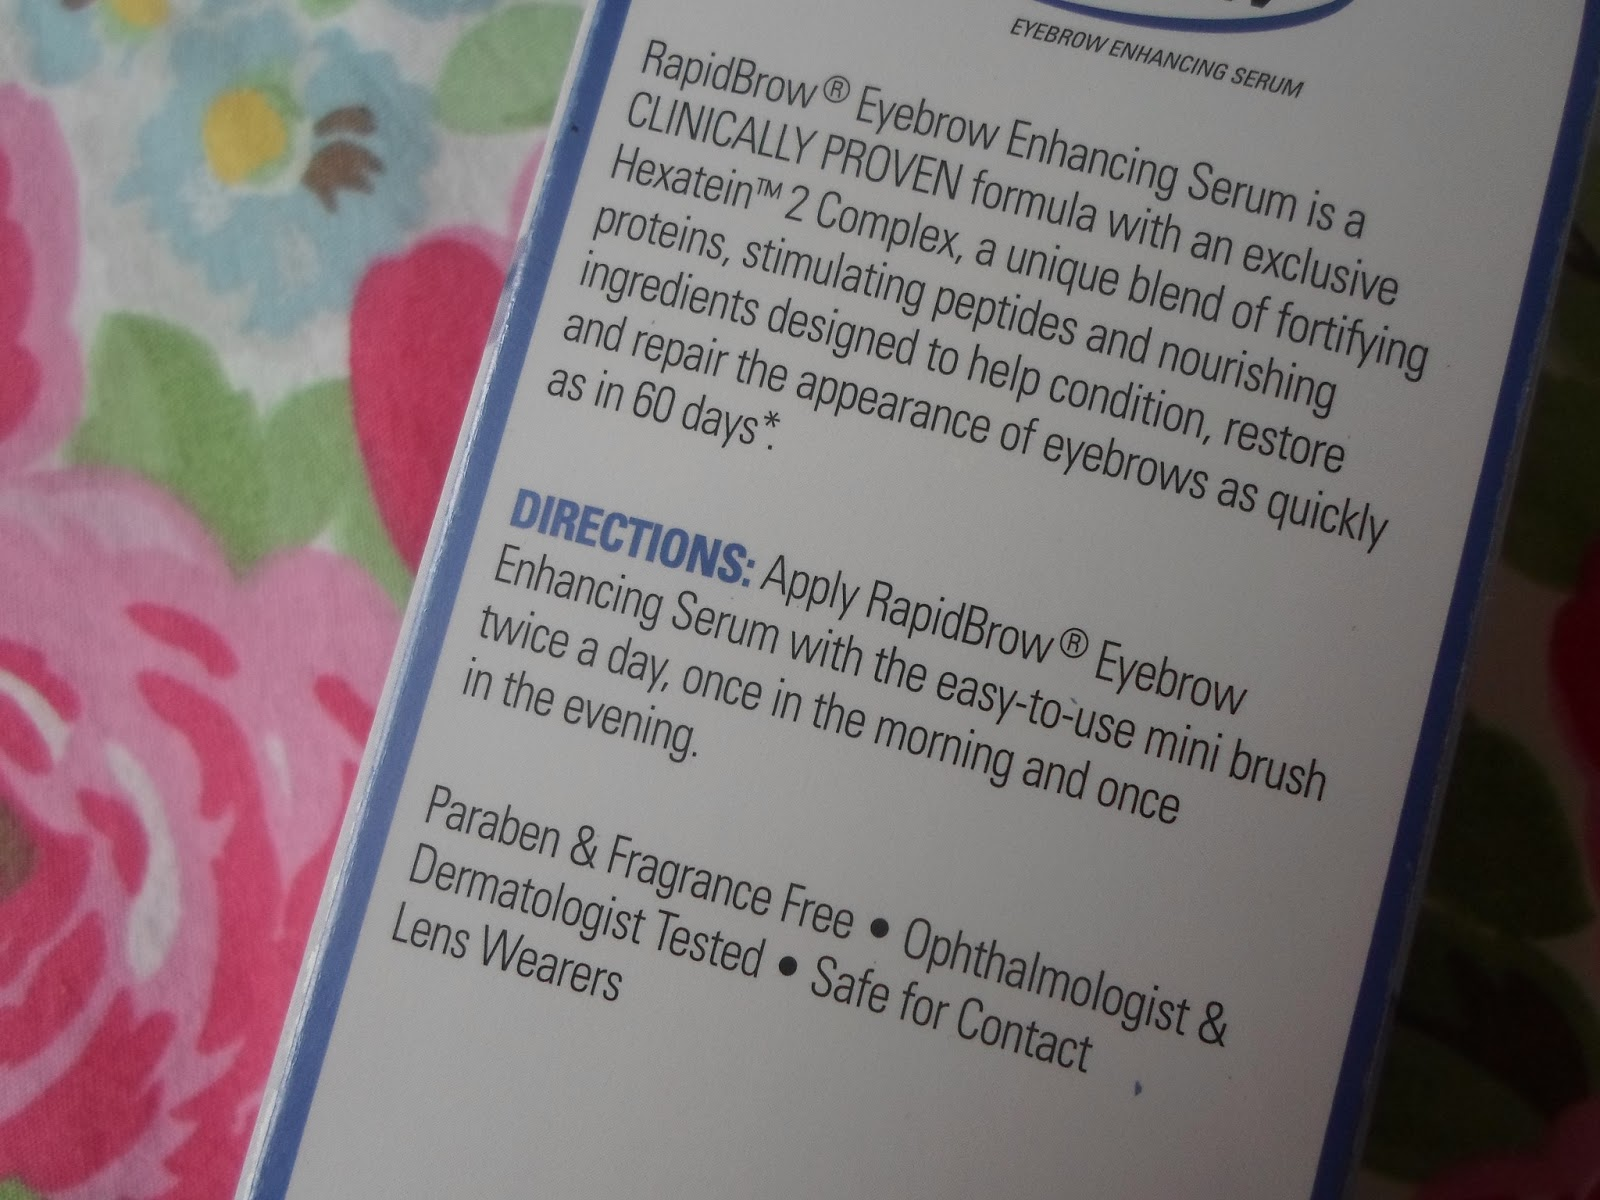 Ellies Ramblings Review Rapidbrow Eyebrow Enhancing Serum